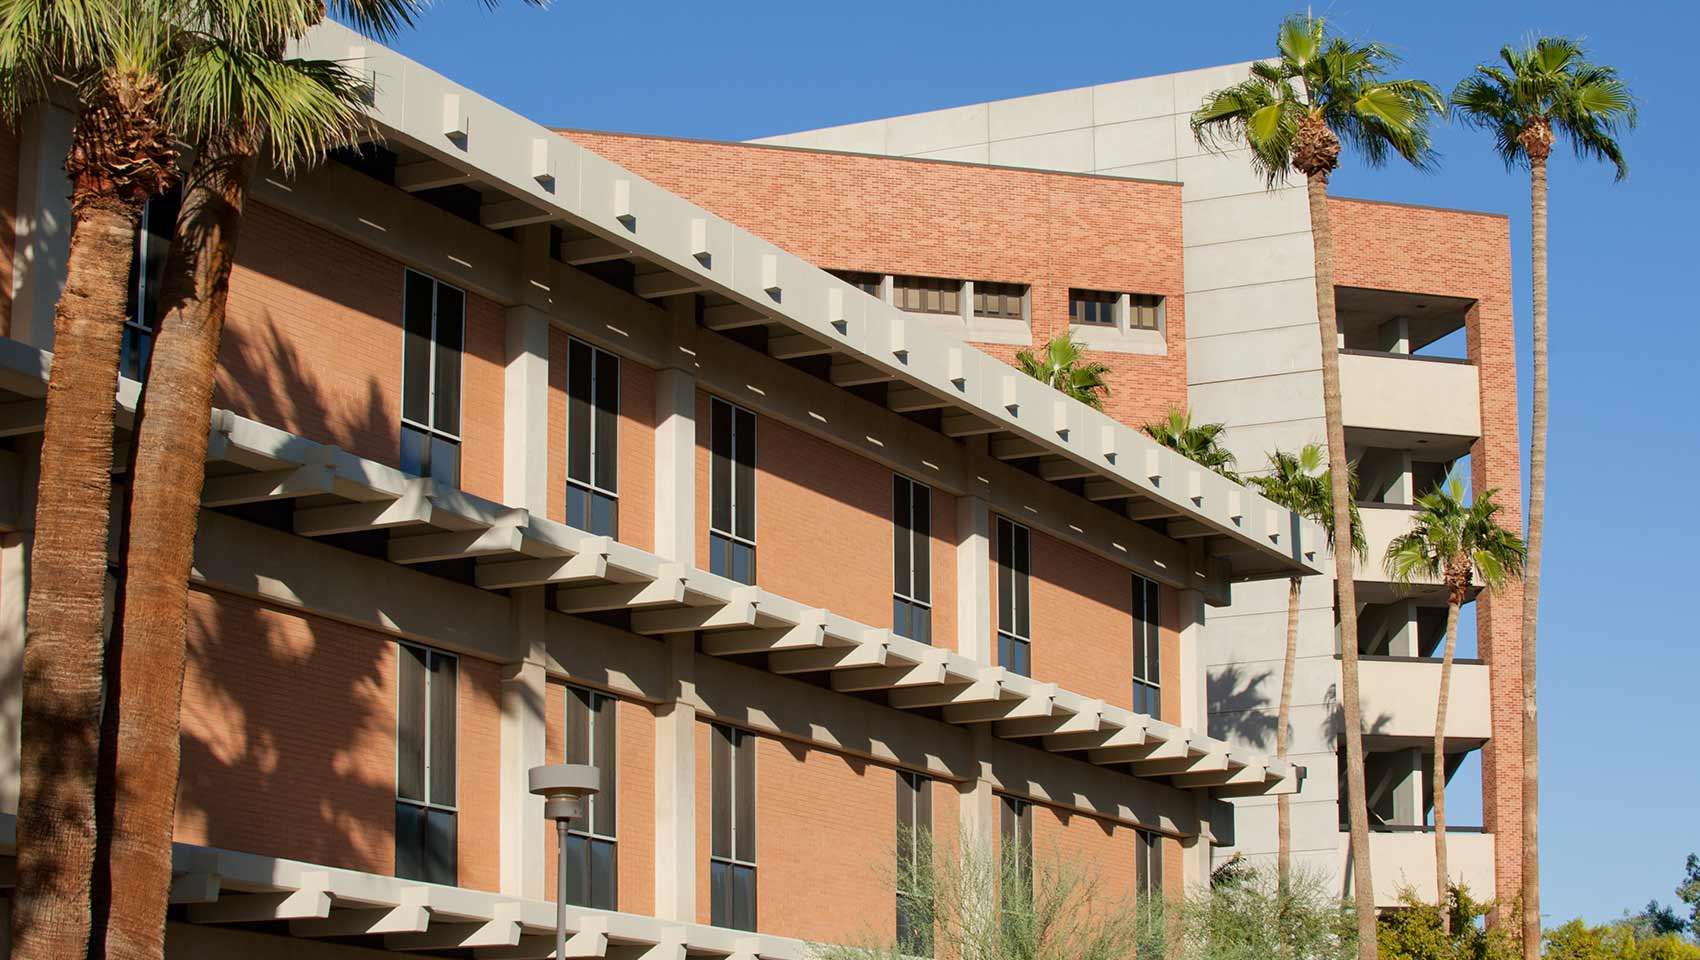 arizona state university phoenix hotels kimpton palomar